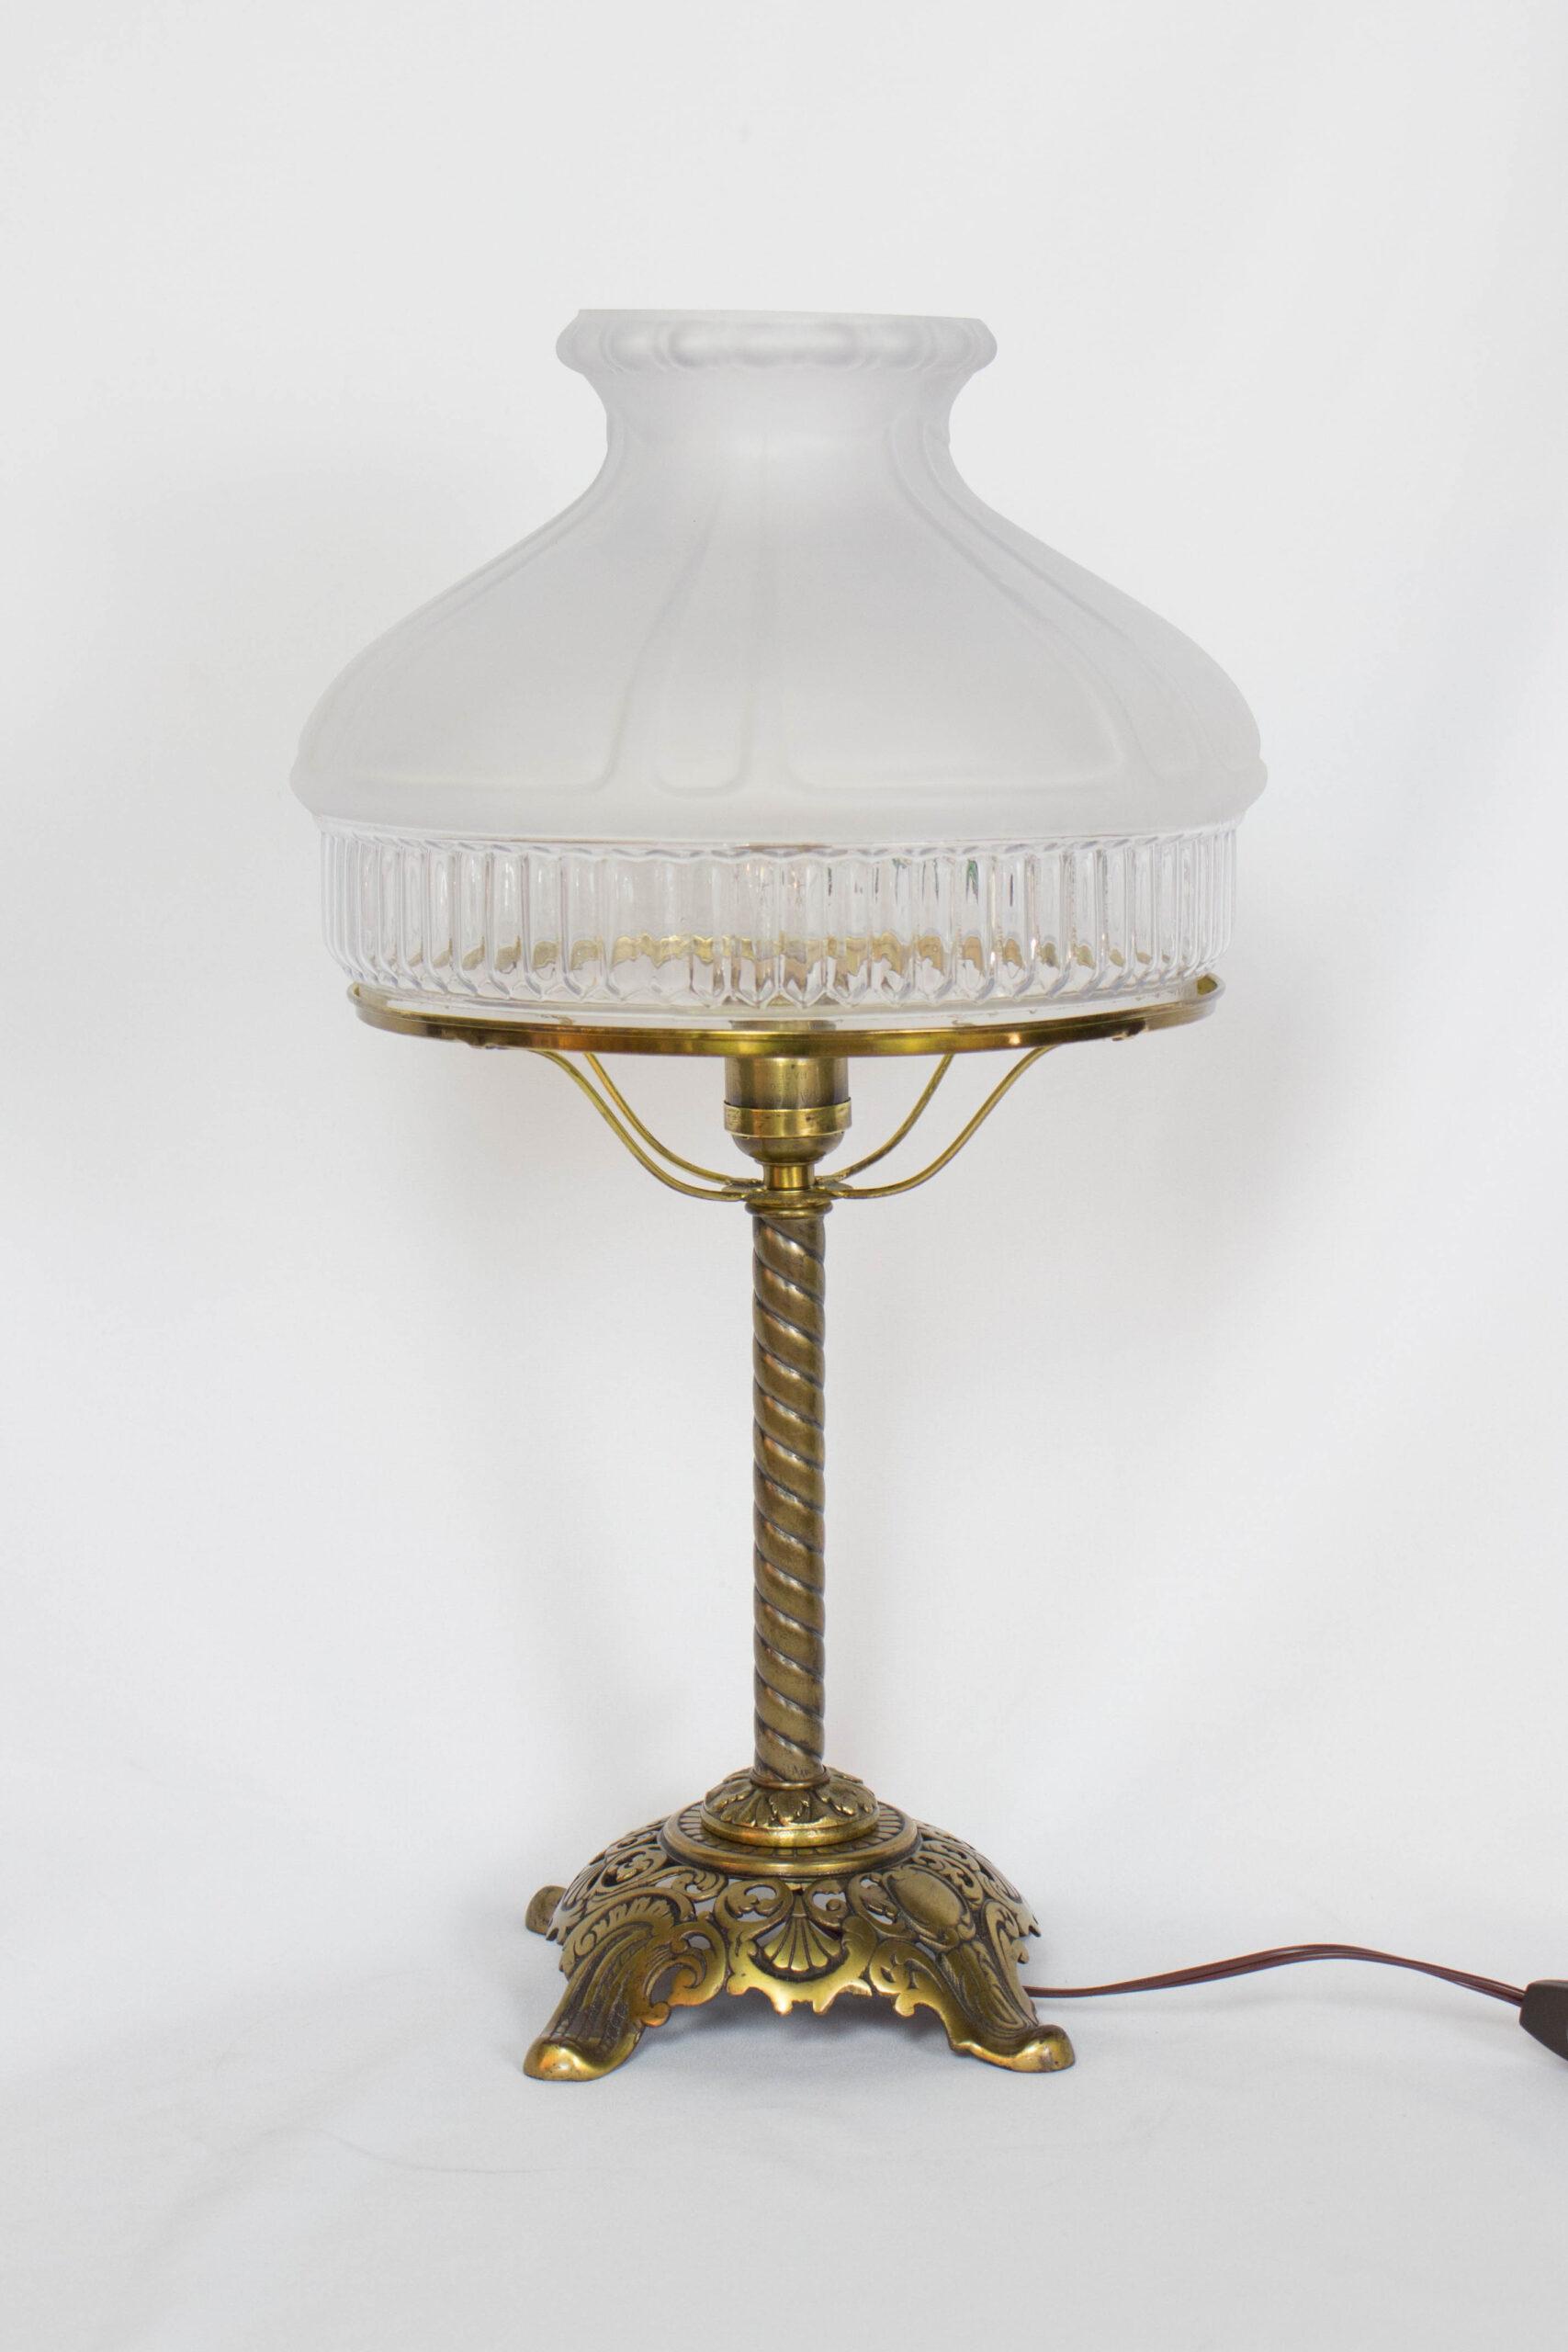 Miller Gas Table Lamp Appleton Antique Lighting